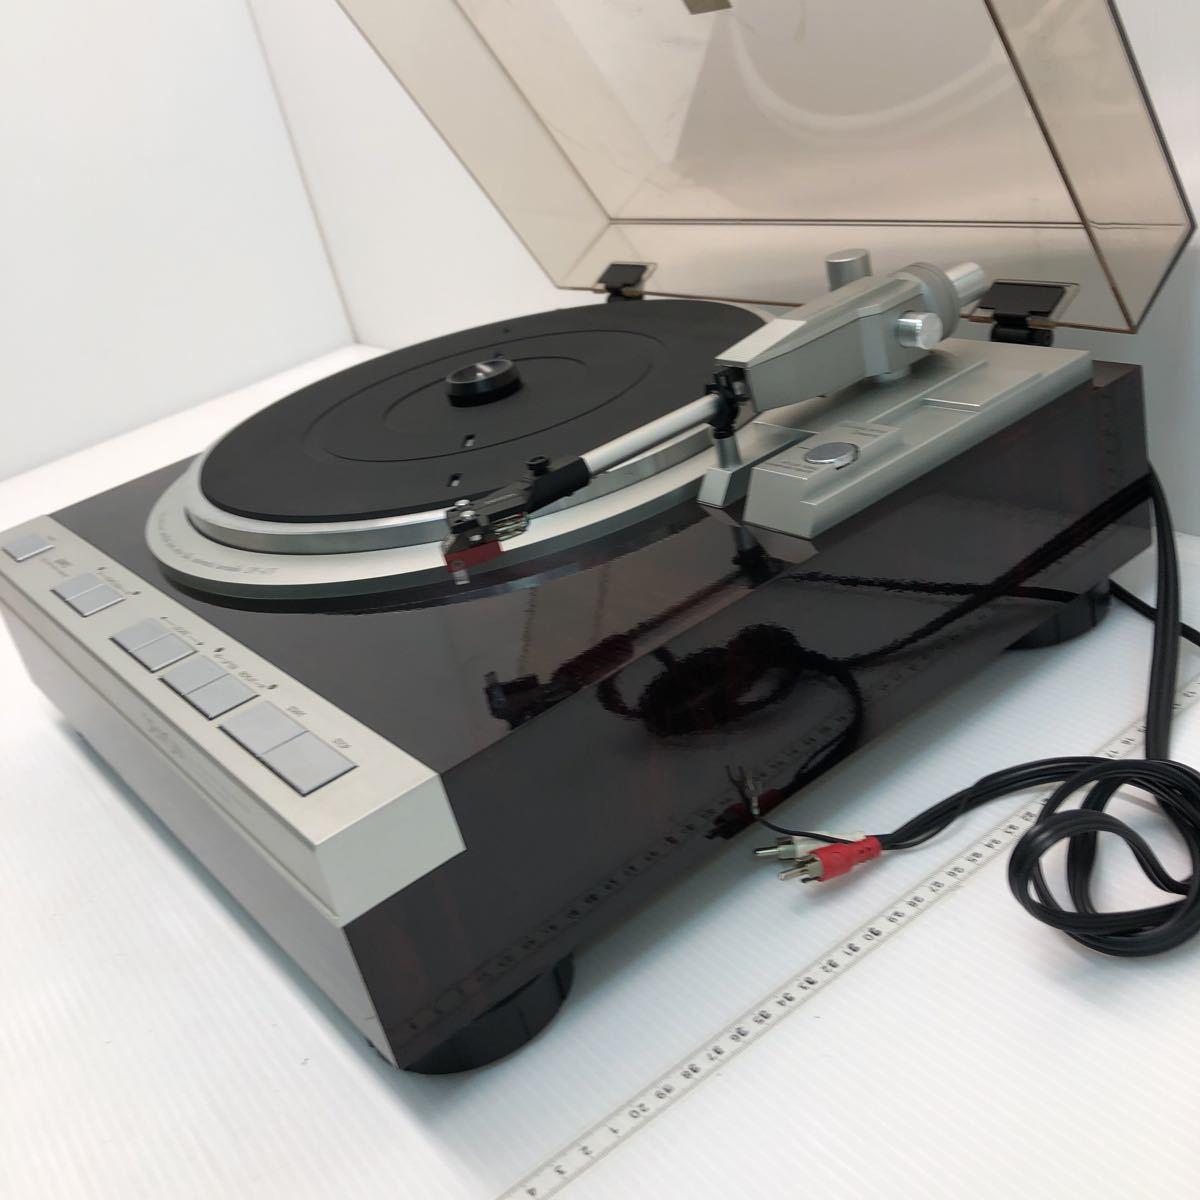 DENON デノン レコードプレーヤー DP-47F 通電のみ確認 ジャンク 1円スタート_画像7